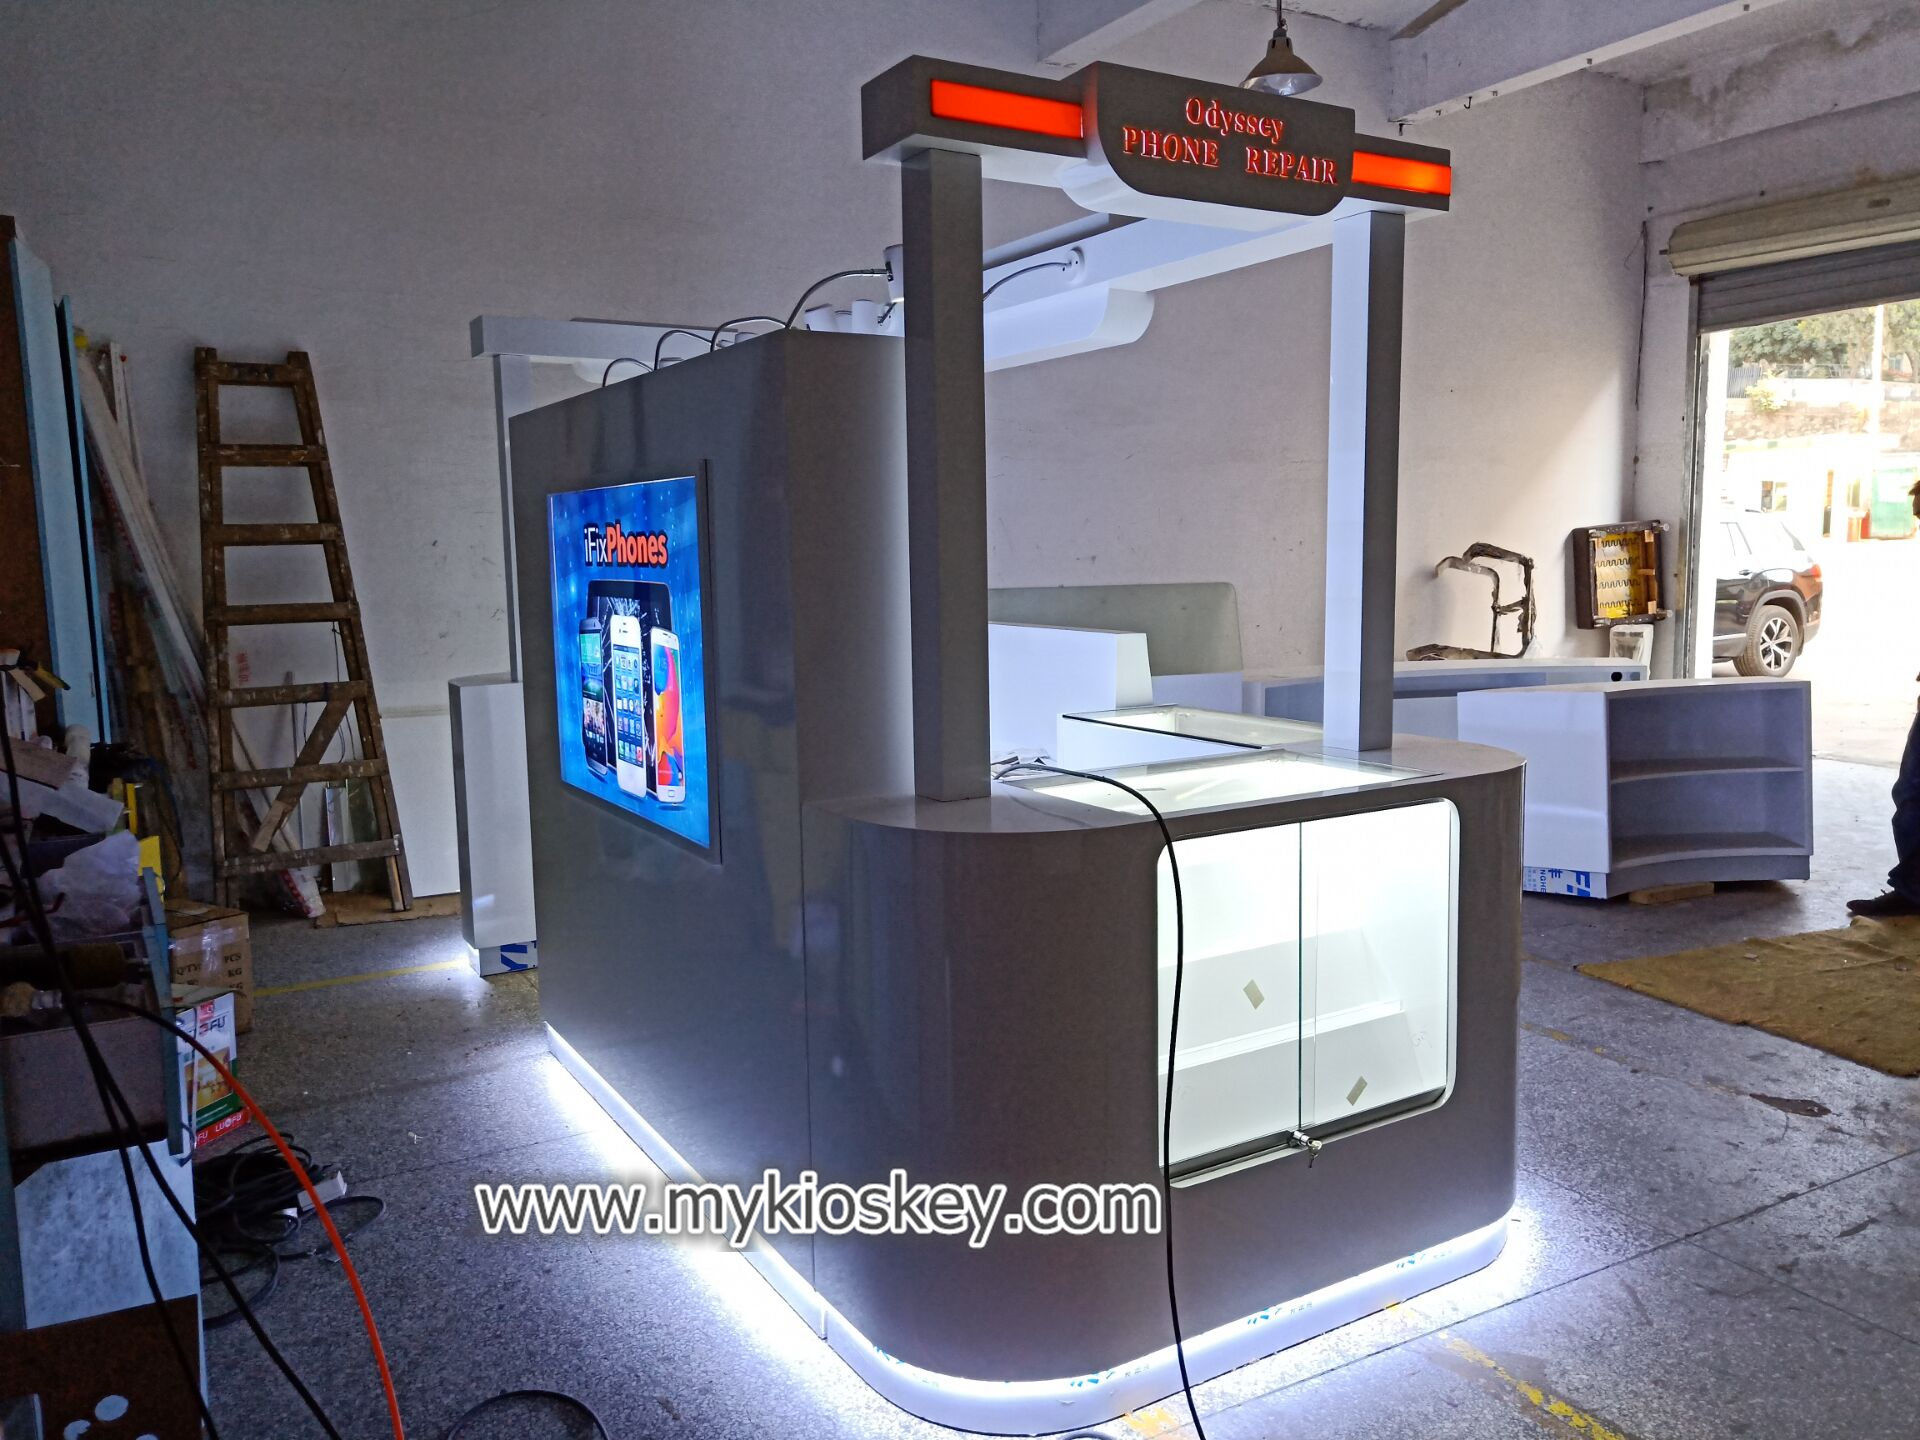 cellphone repair kiosk